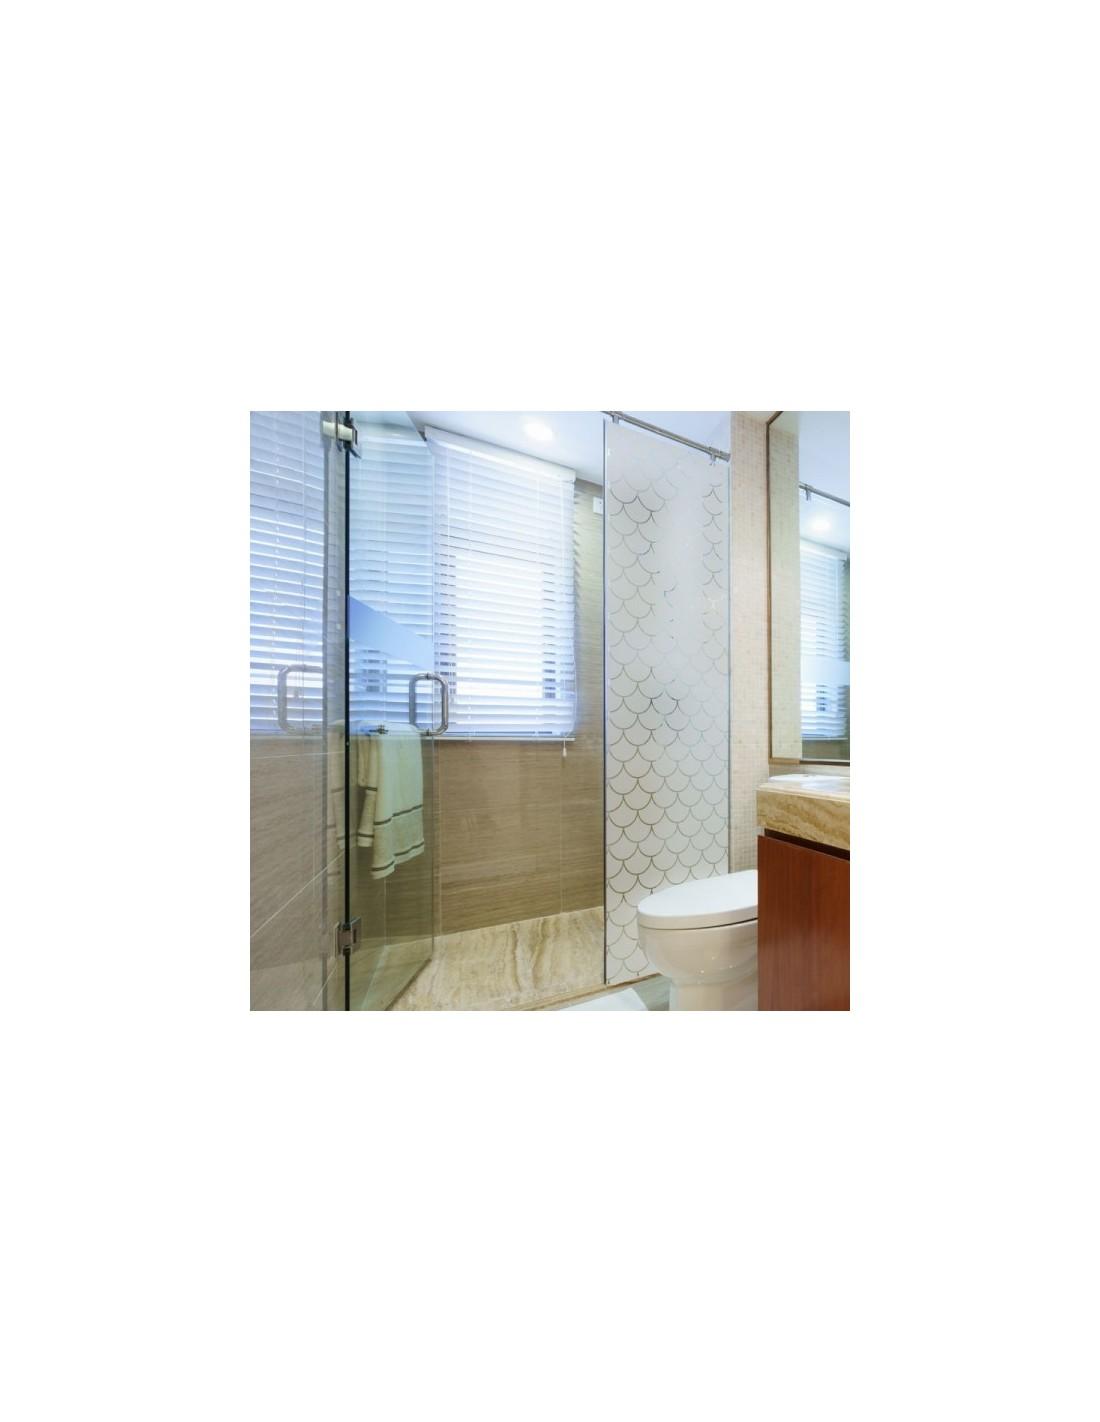 Latest film design vitre with adhesif pour paroi douche - Carrelage adhesif douche ...